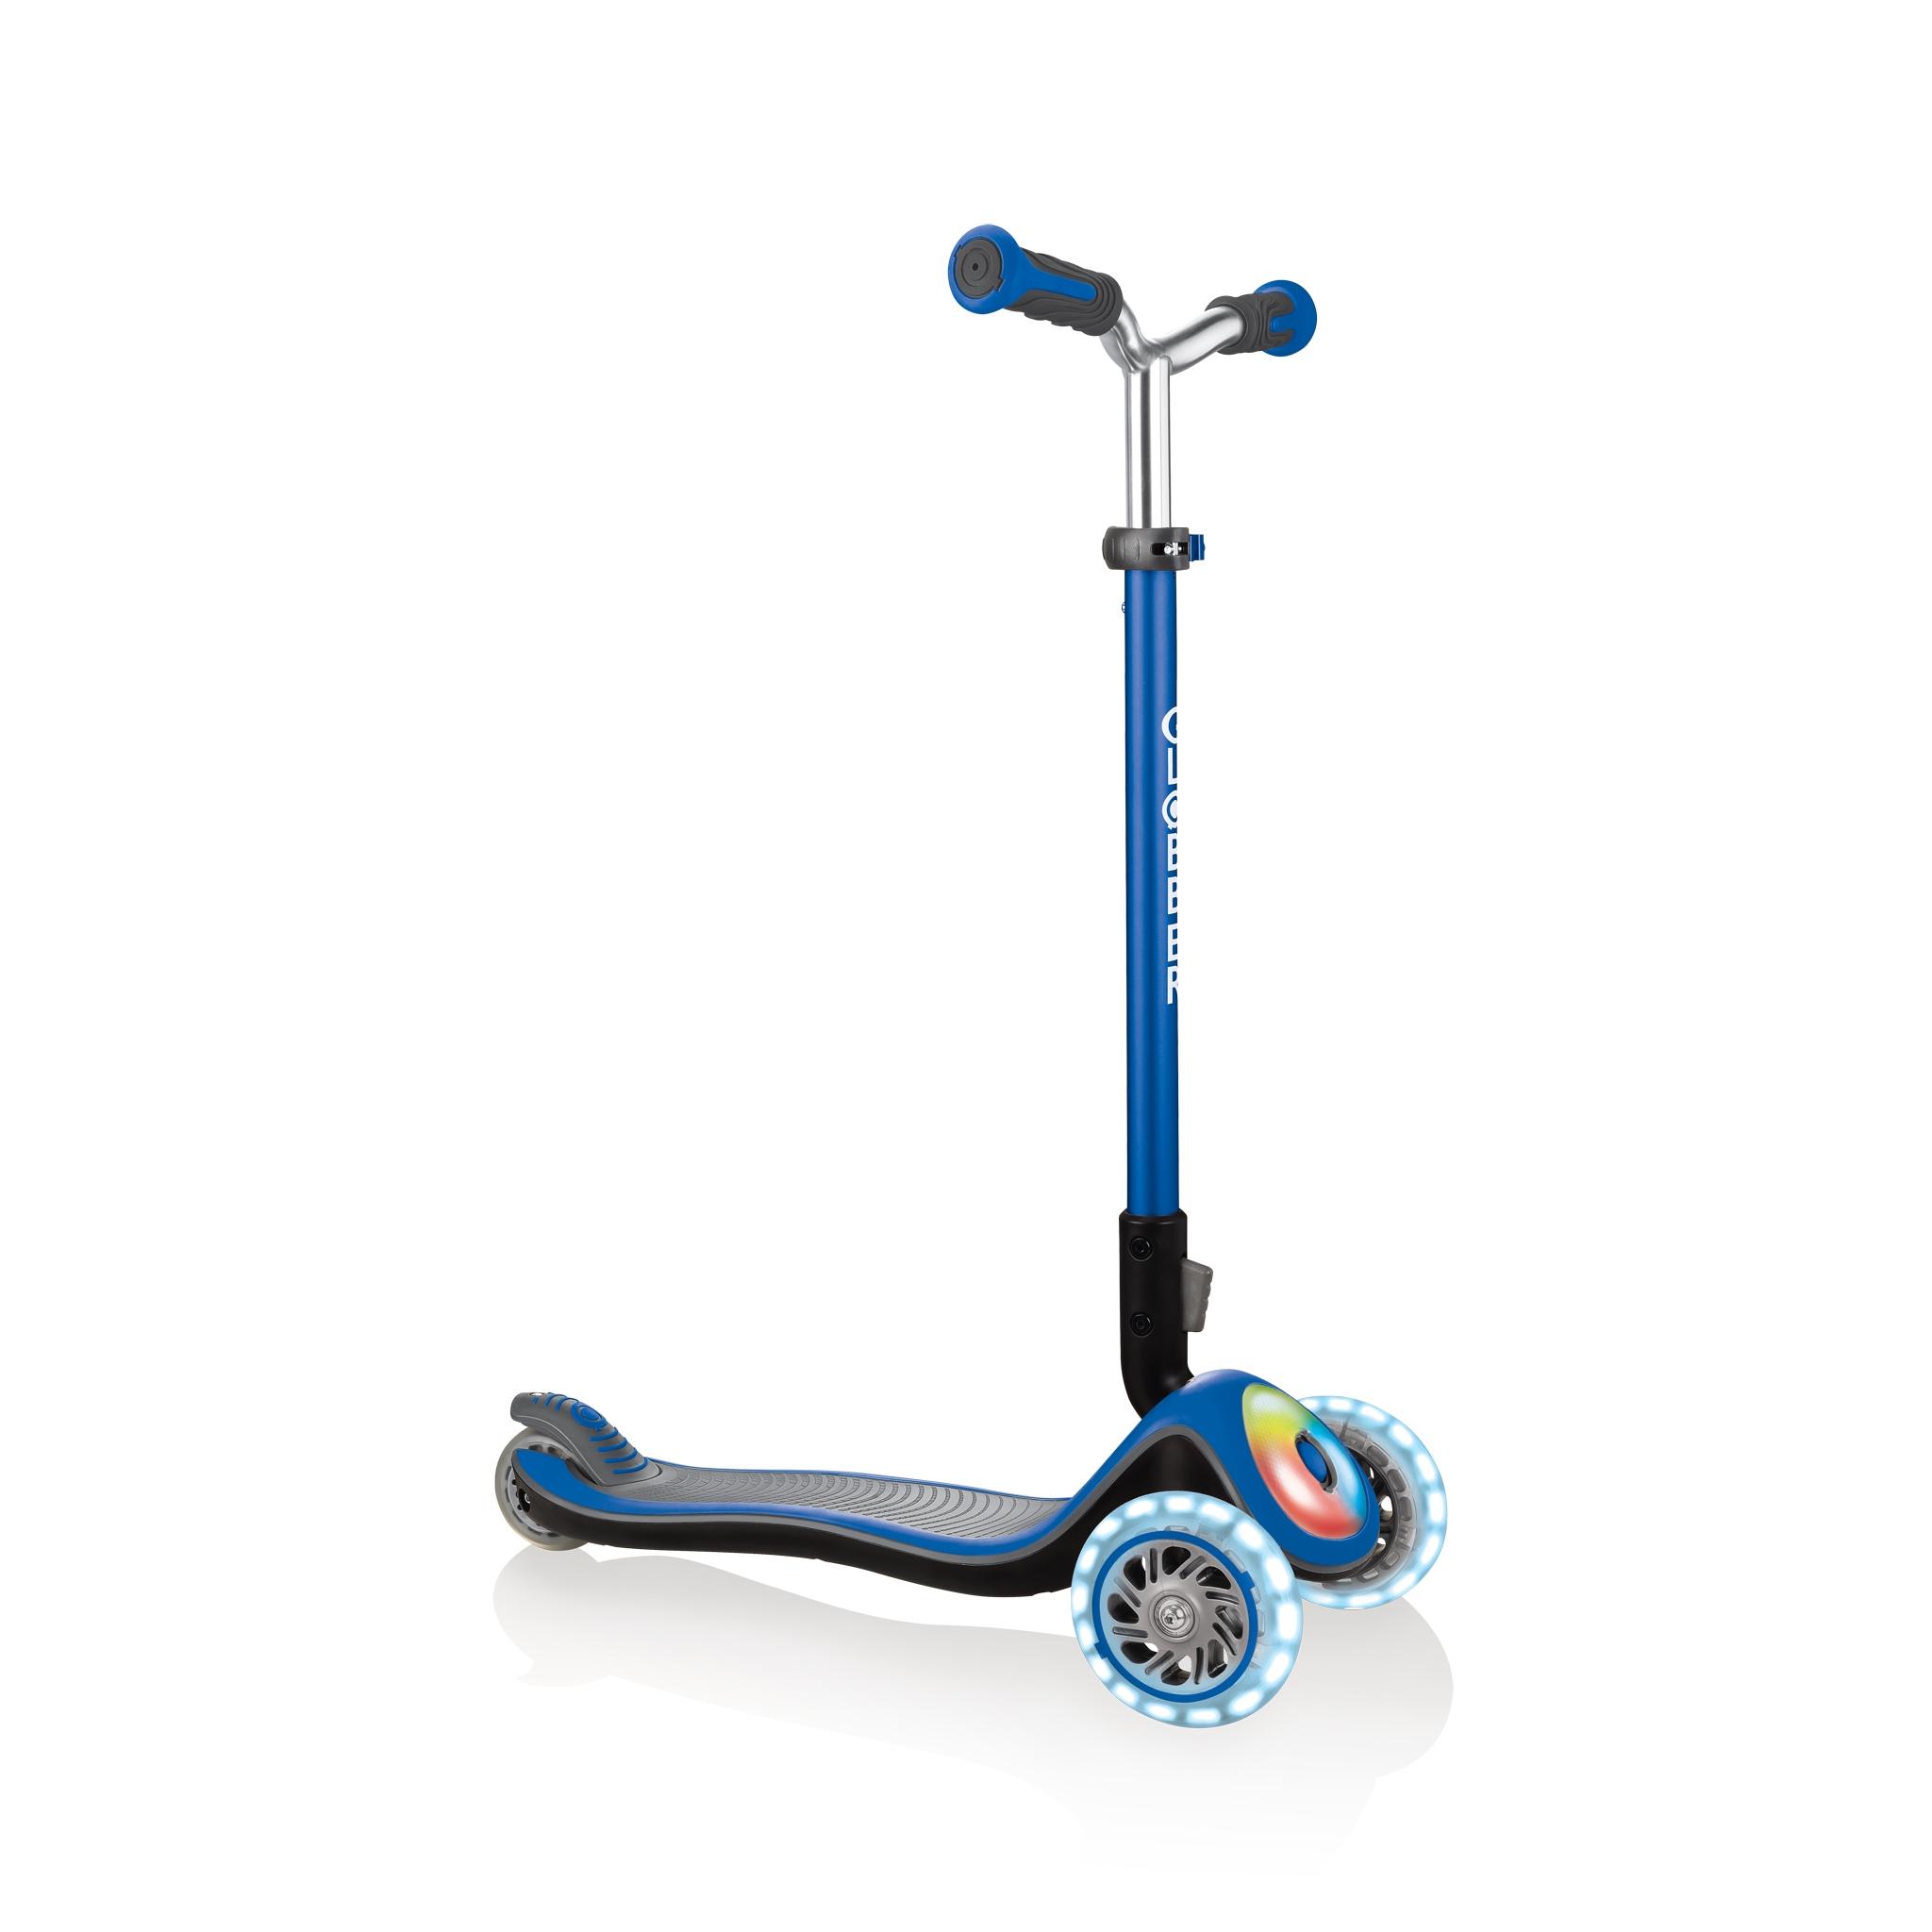 Globber-ELITE-PRIME-best-3-wheel-foldable-scooter-for-kids-aged-3+-navy-blue 0